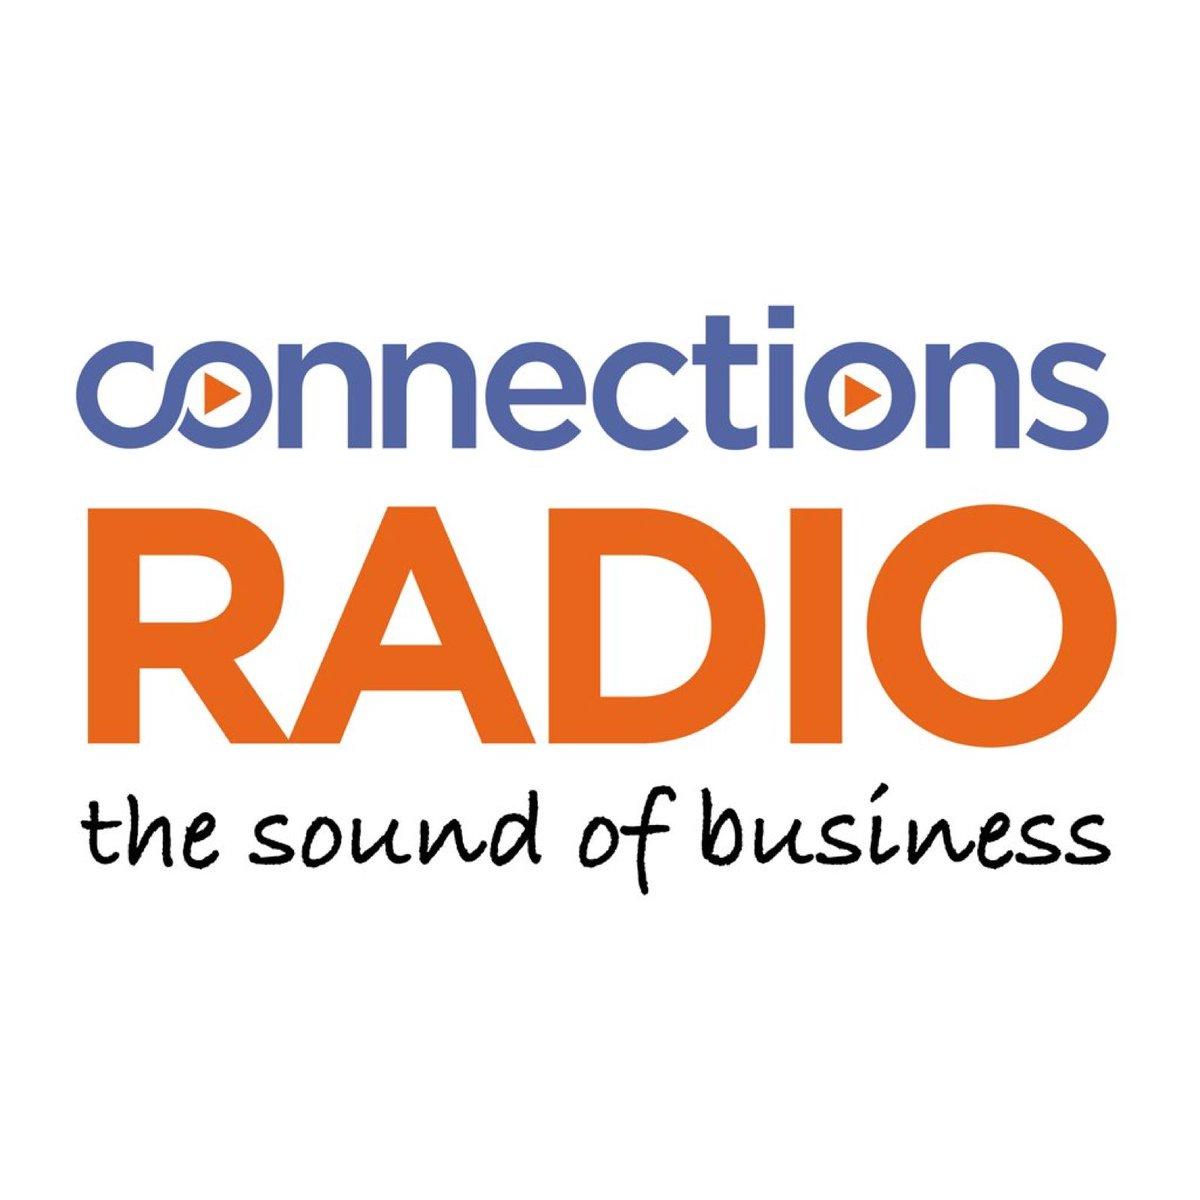 Connections Radio